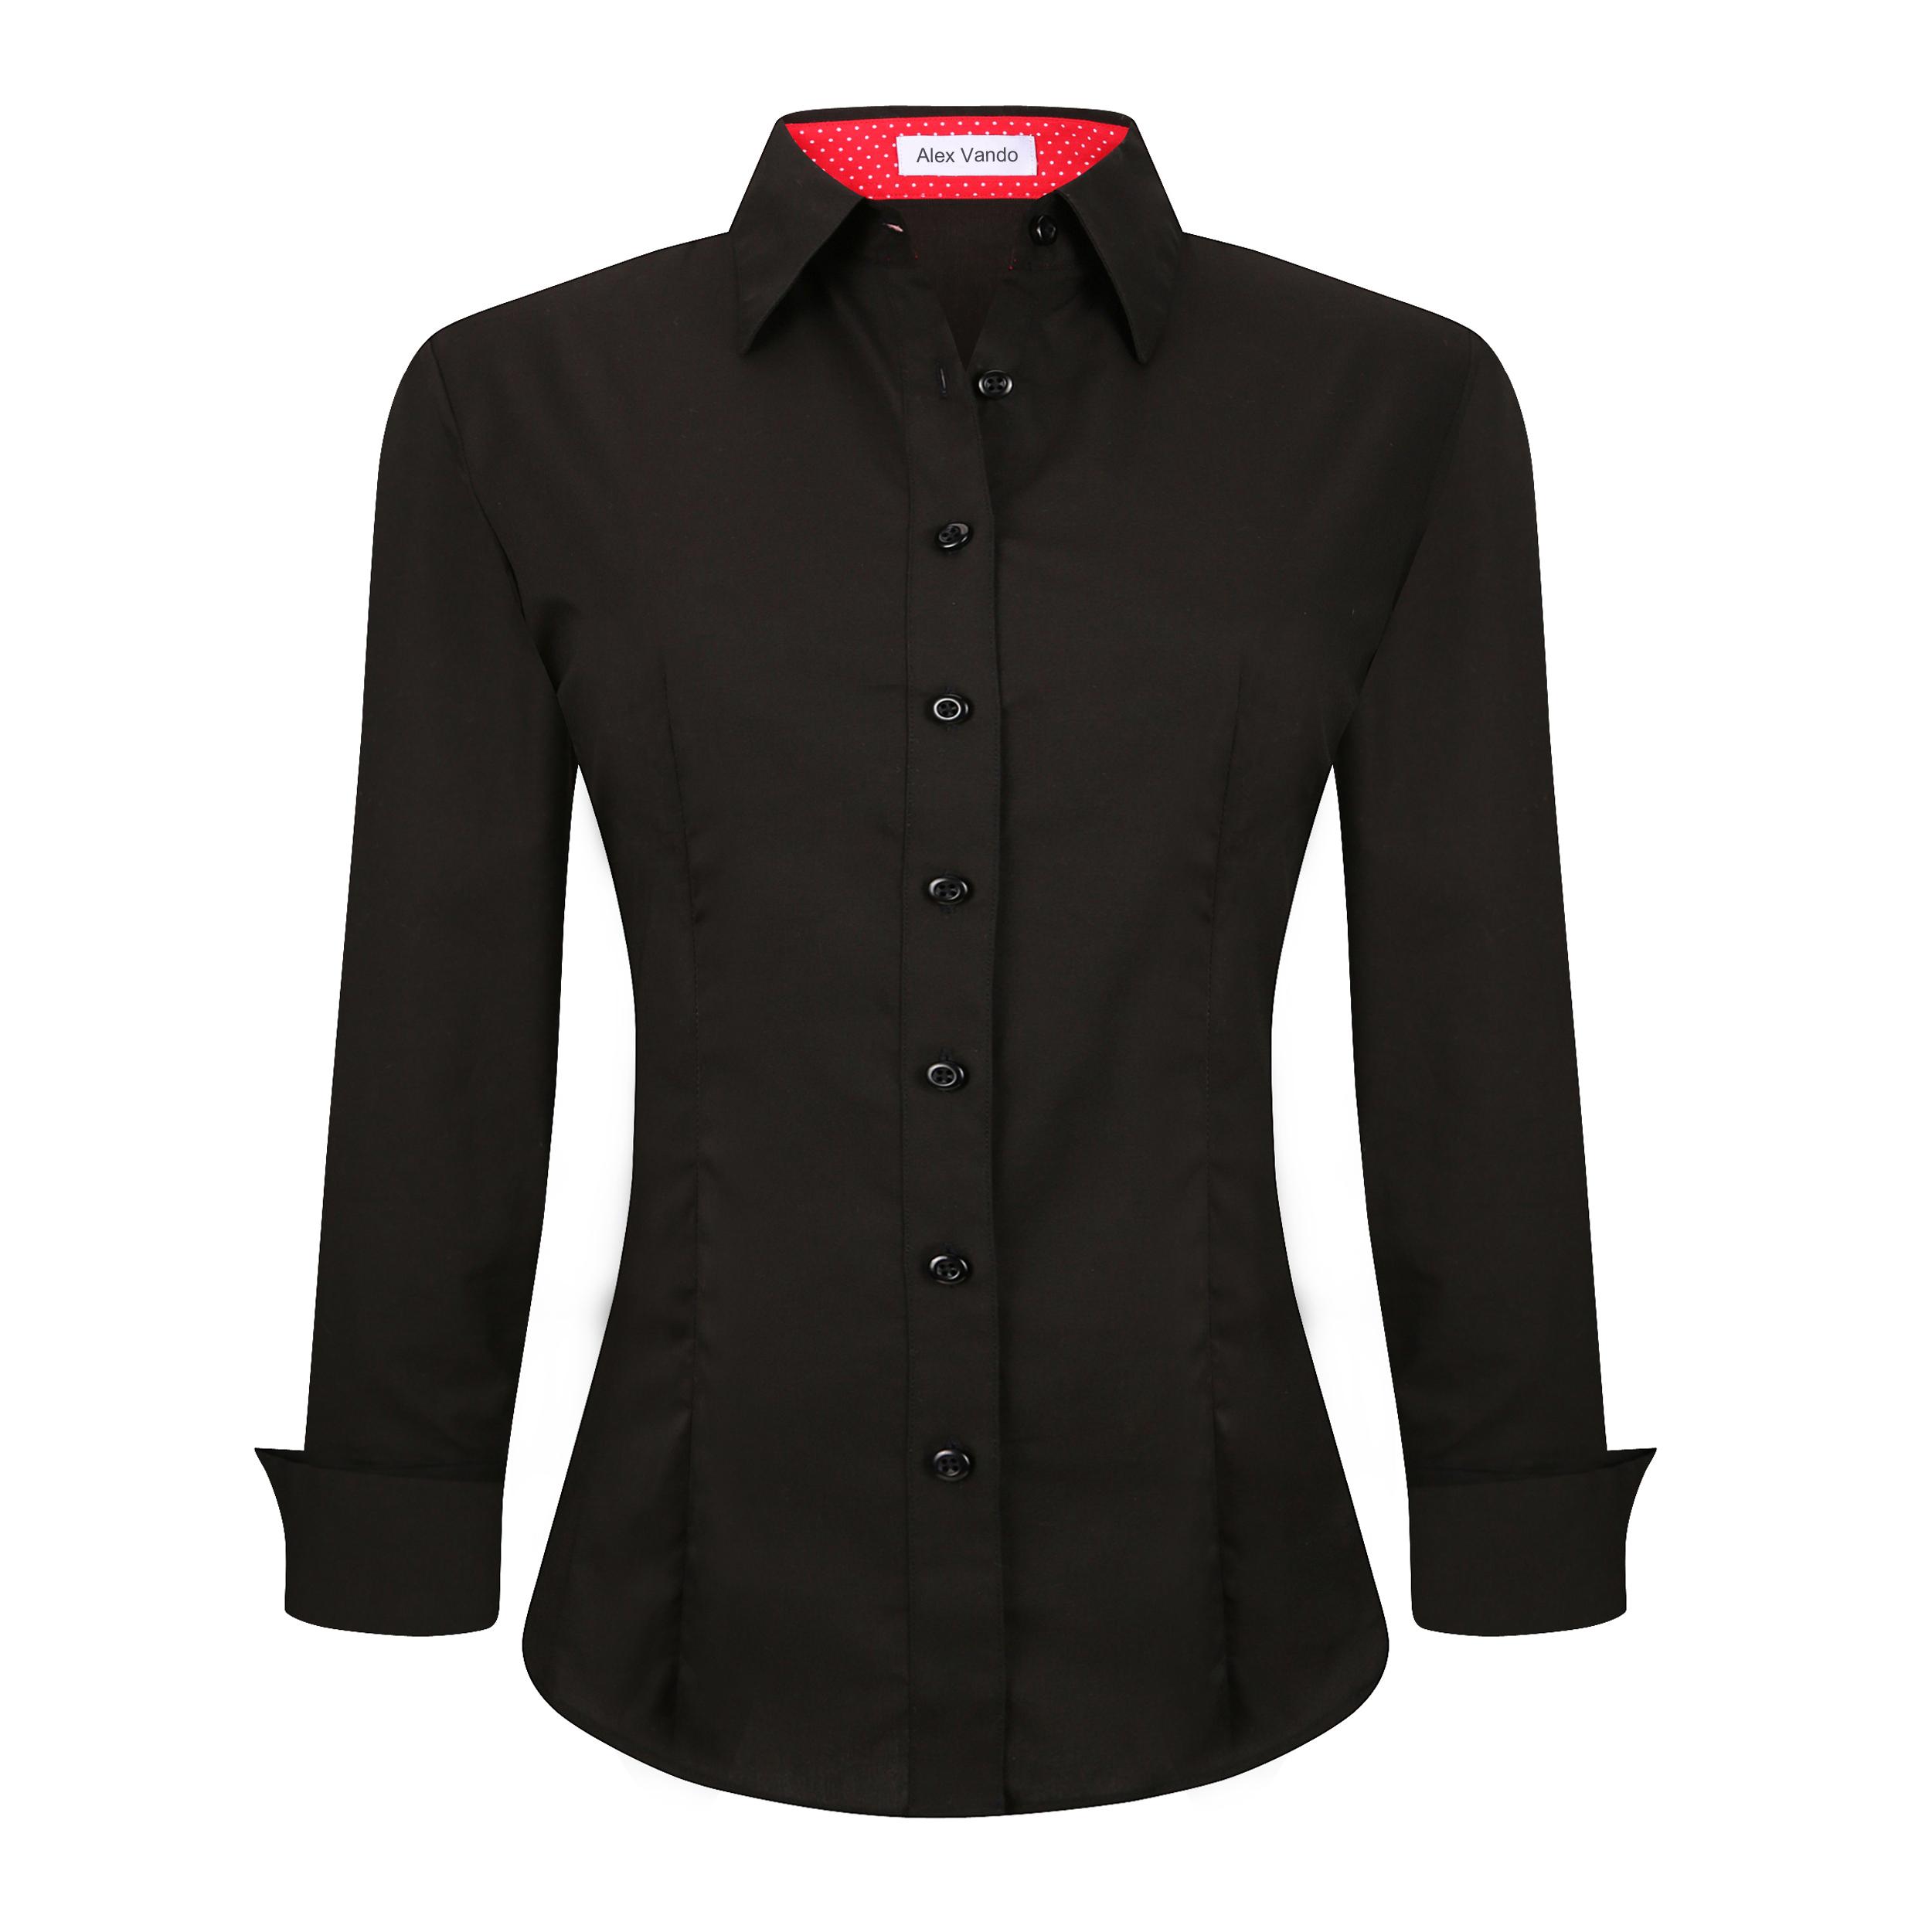 856130fe326f Womens Button Down Shirts Long Sleeve Cotton Stretch Work Shirt Black Item  NO: Women-01-Black